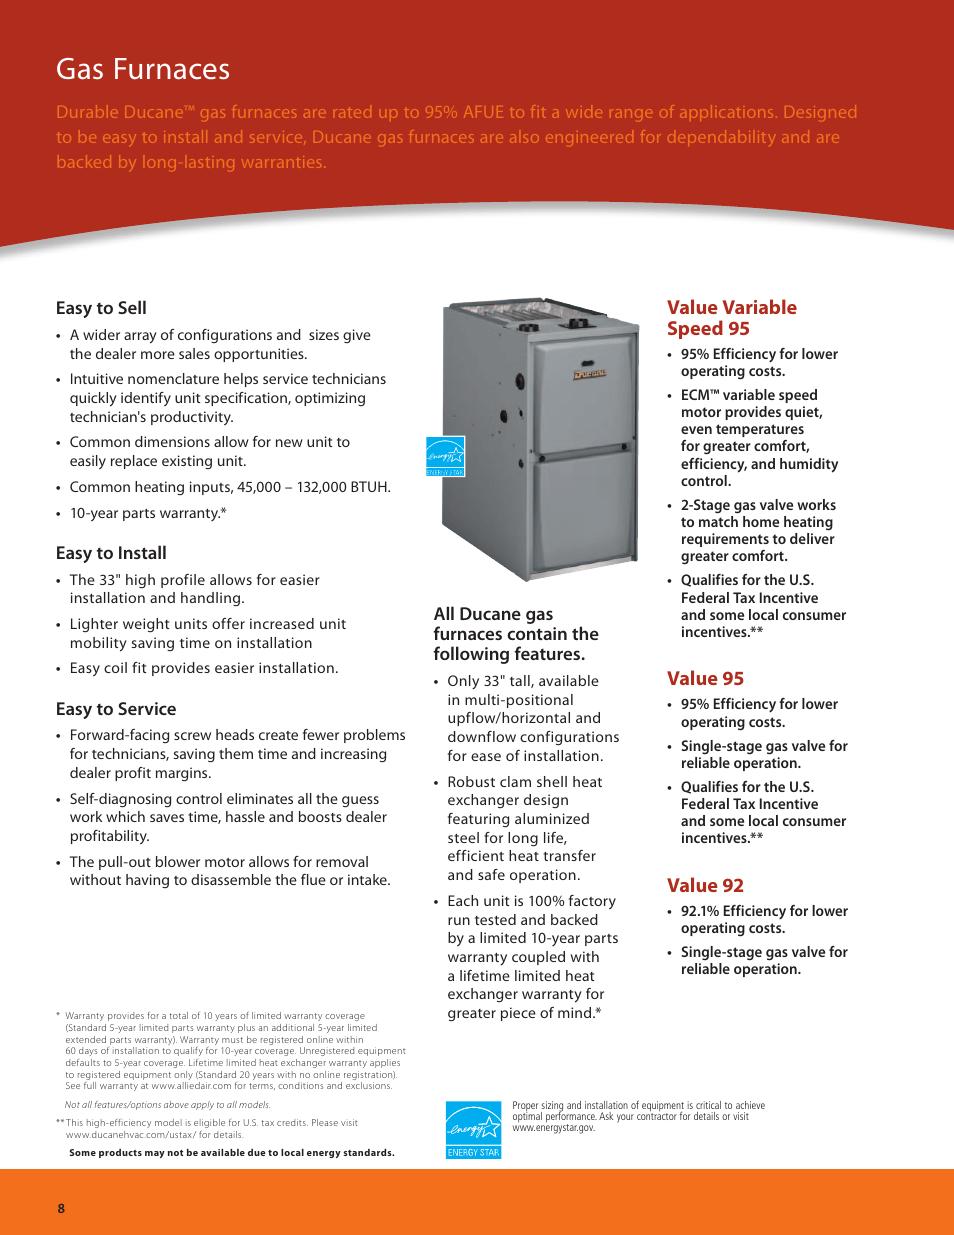 medium resolution of gas furnaces value variable speed 95 value 95 ducane hvac air rh manualsdir com ducane furnace parts diagram ducane furnace parts manual